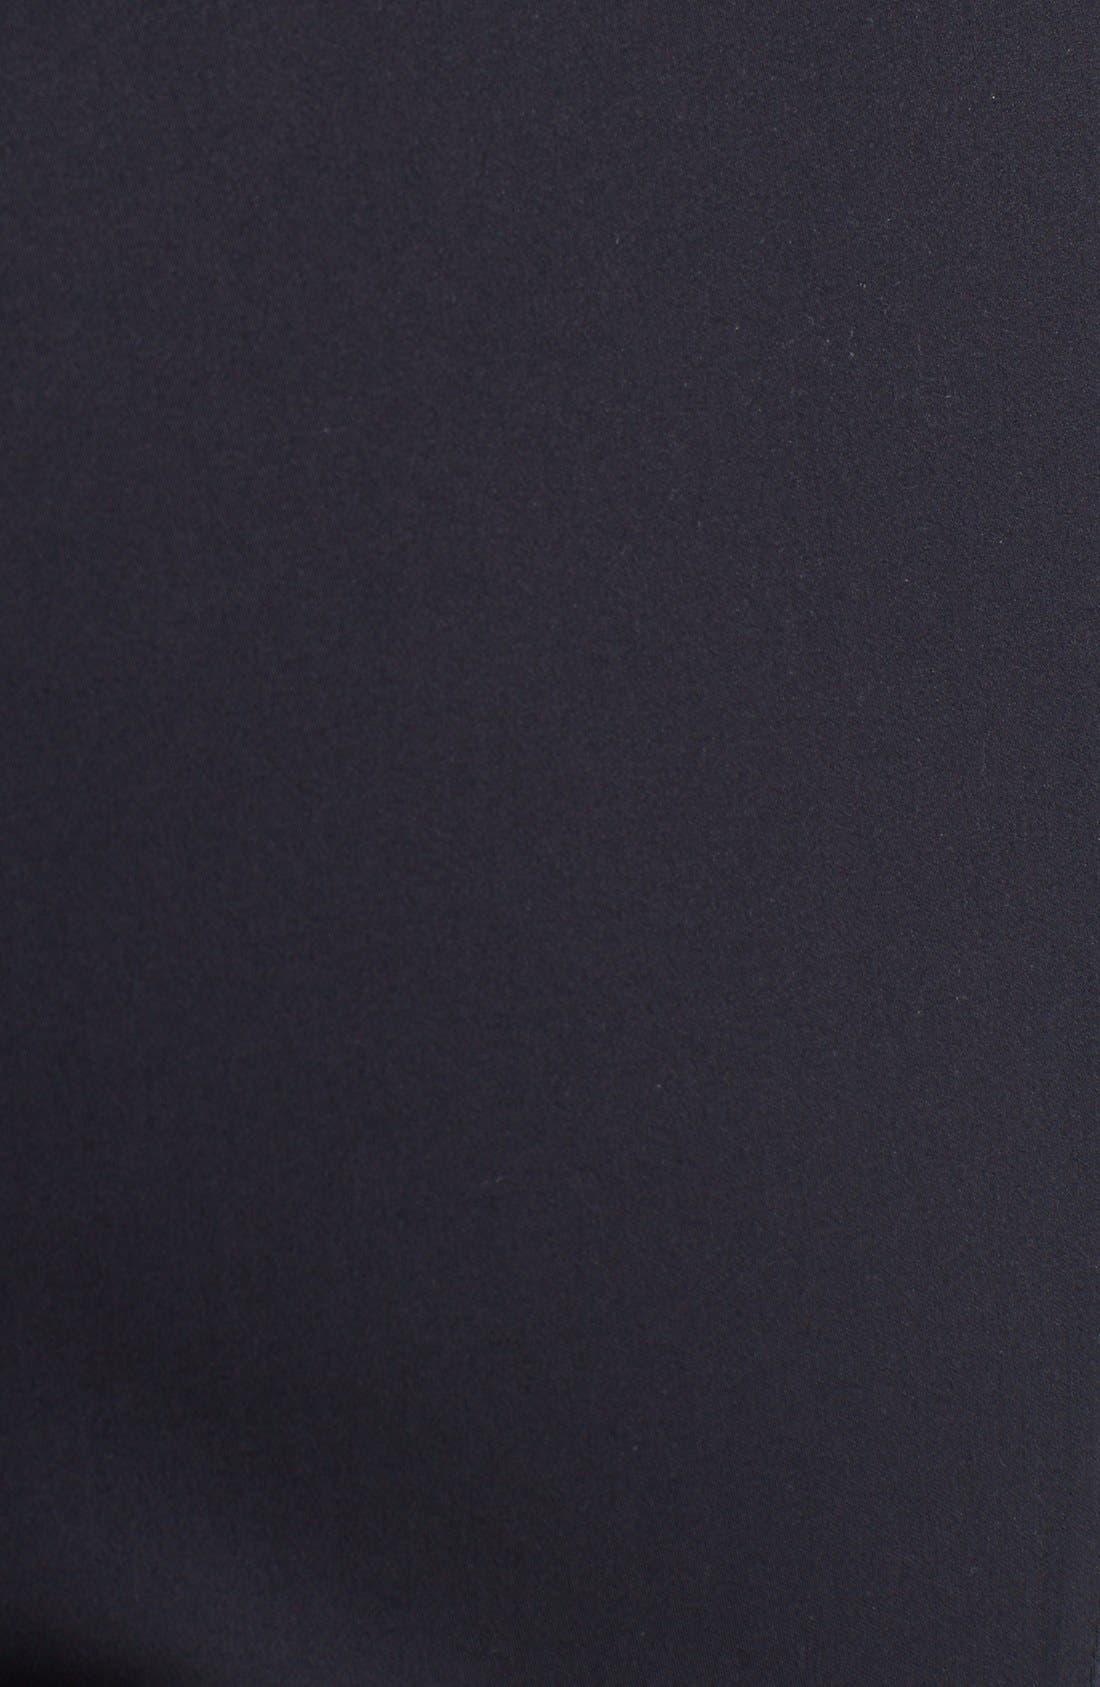 Alternate Image 3  - Max Mara 'Floc' Crop Sateen Pants